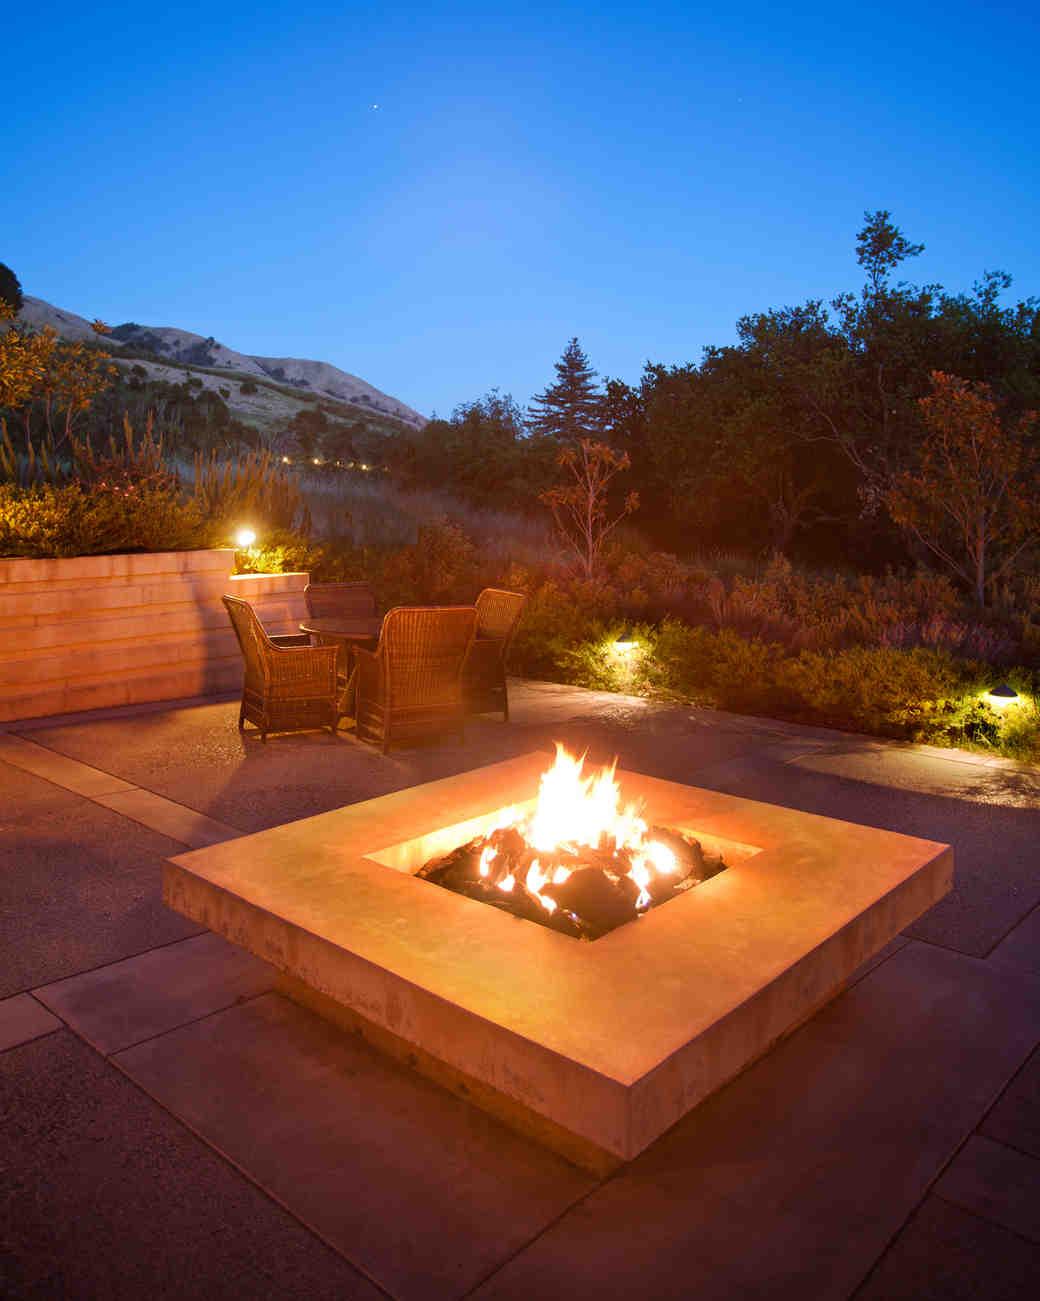 honeymoon-destinations-2015-california-ventana-inn-firepit-0115.jpg